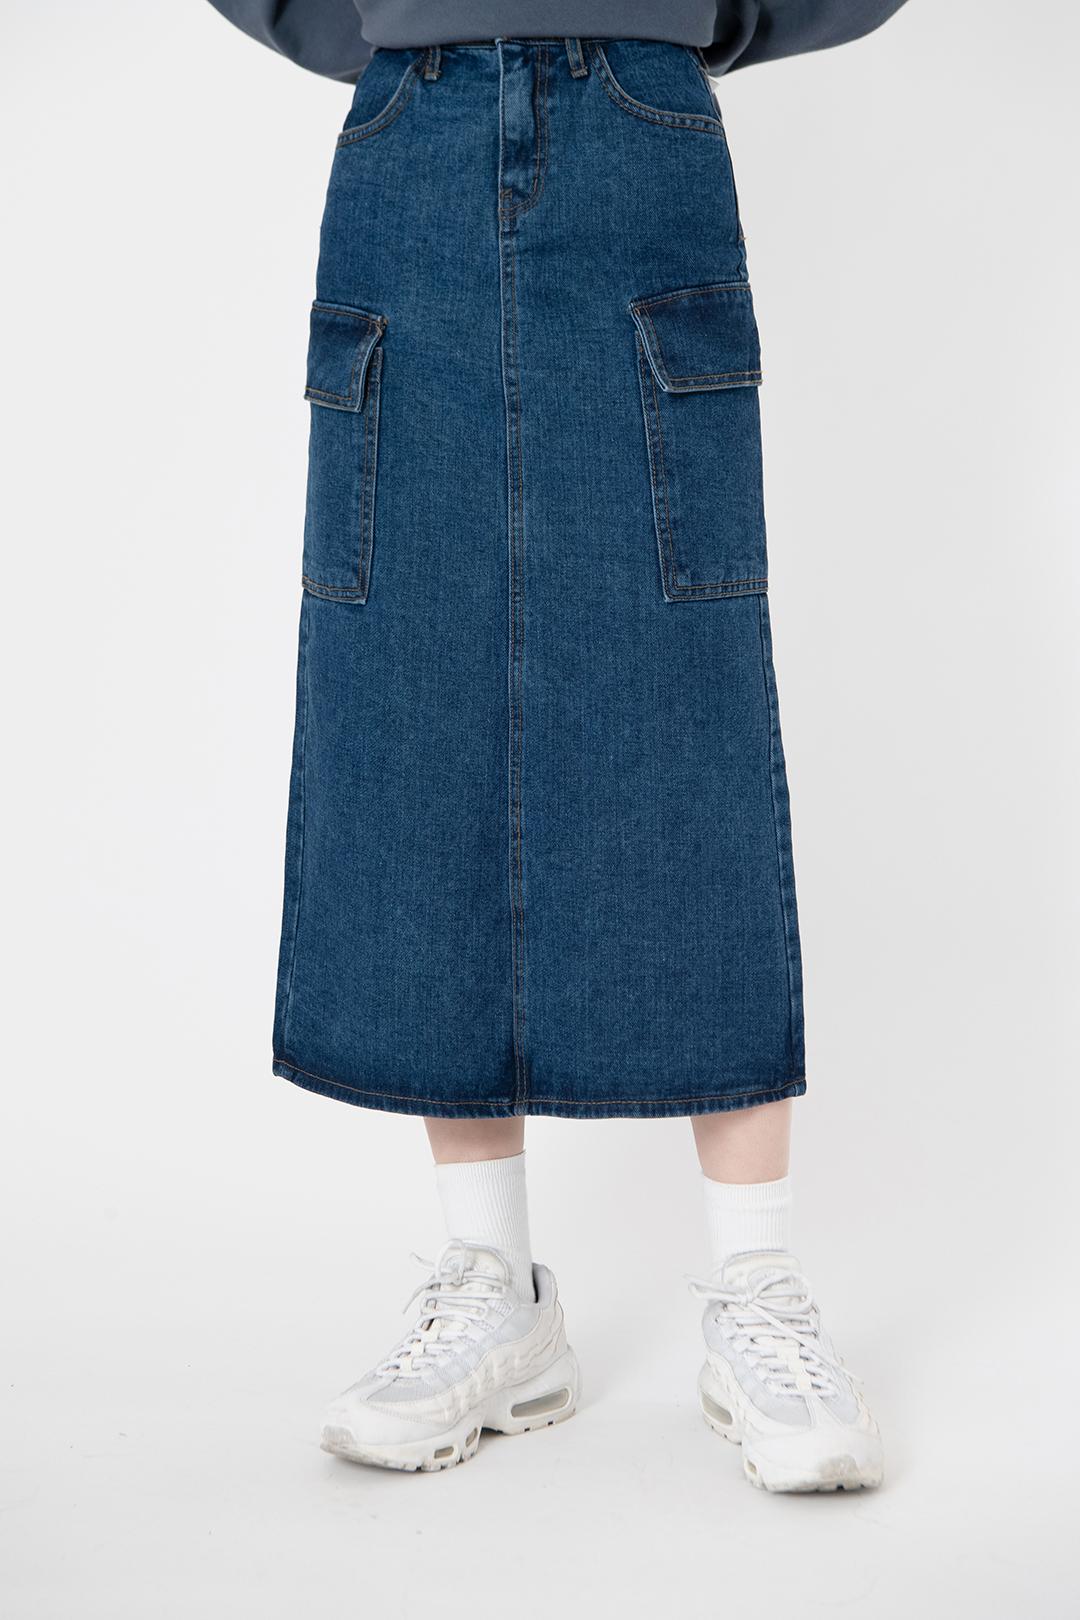 Nini pocket long skirt